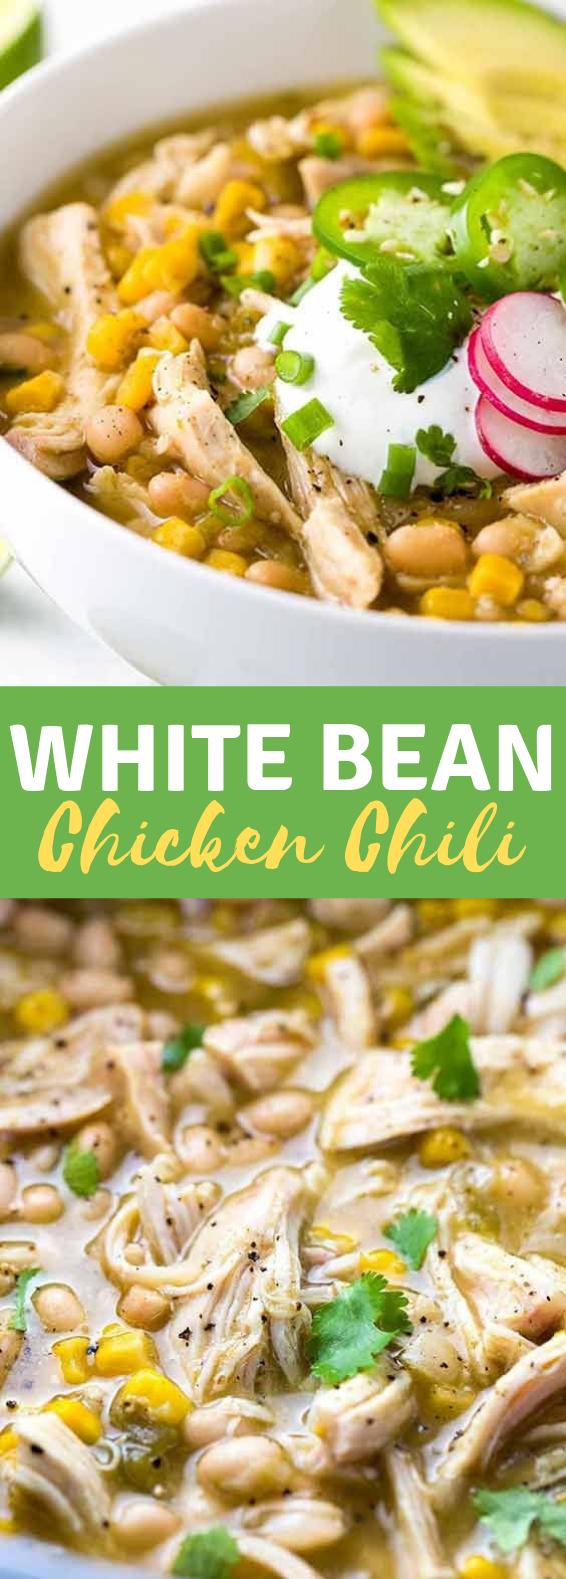 White Bean Chicken Chili #BestRecipe #Dinner